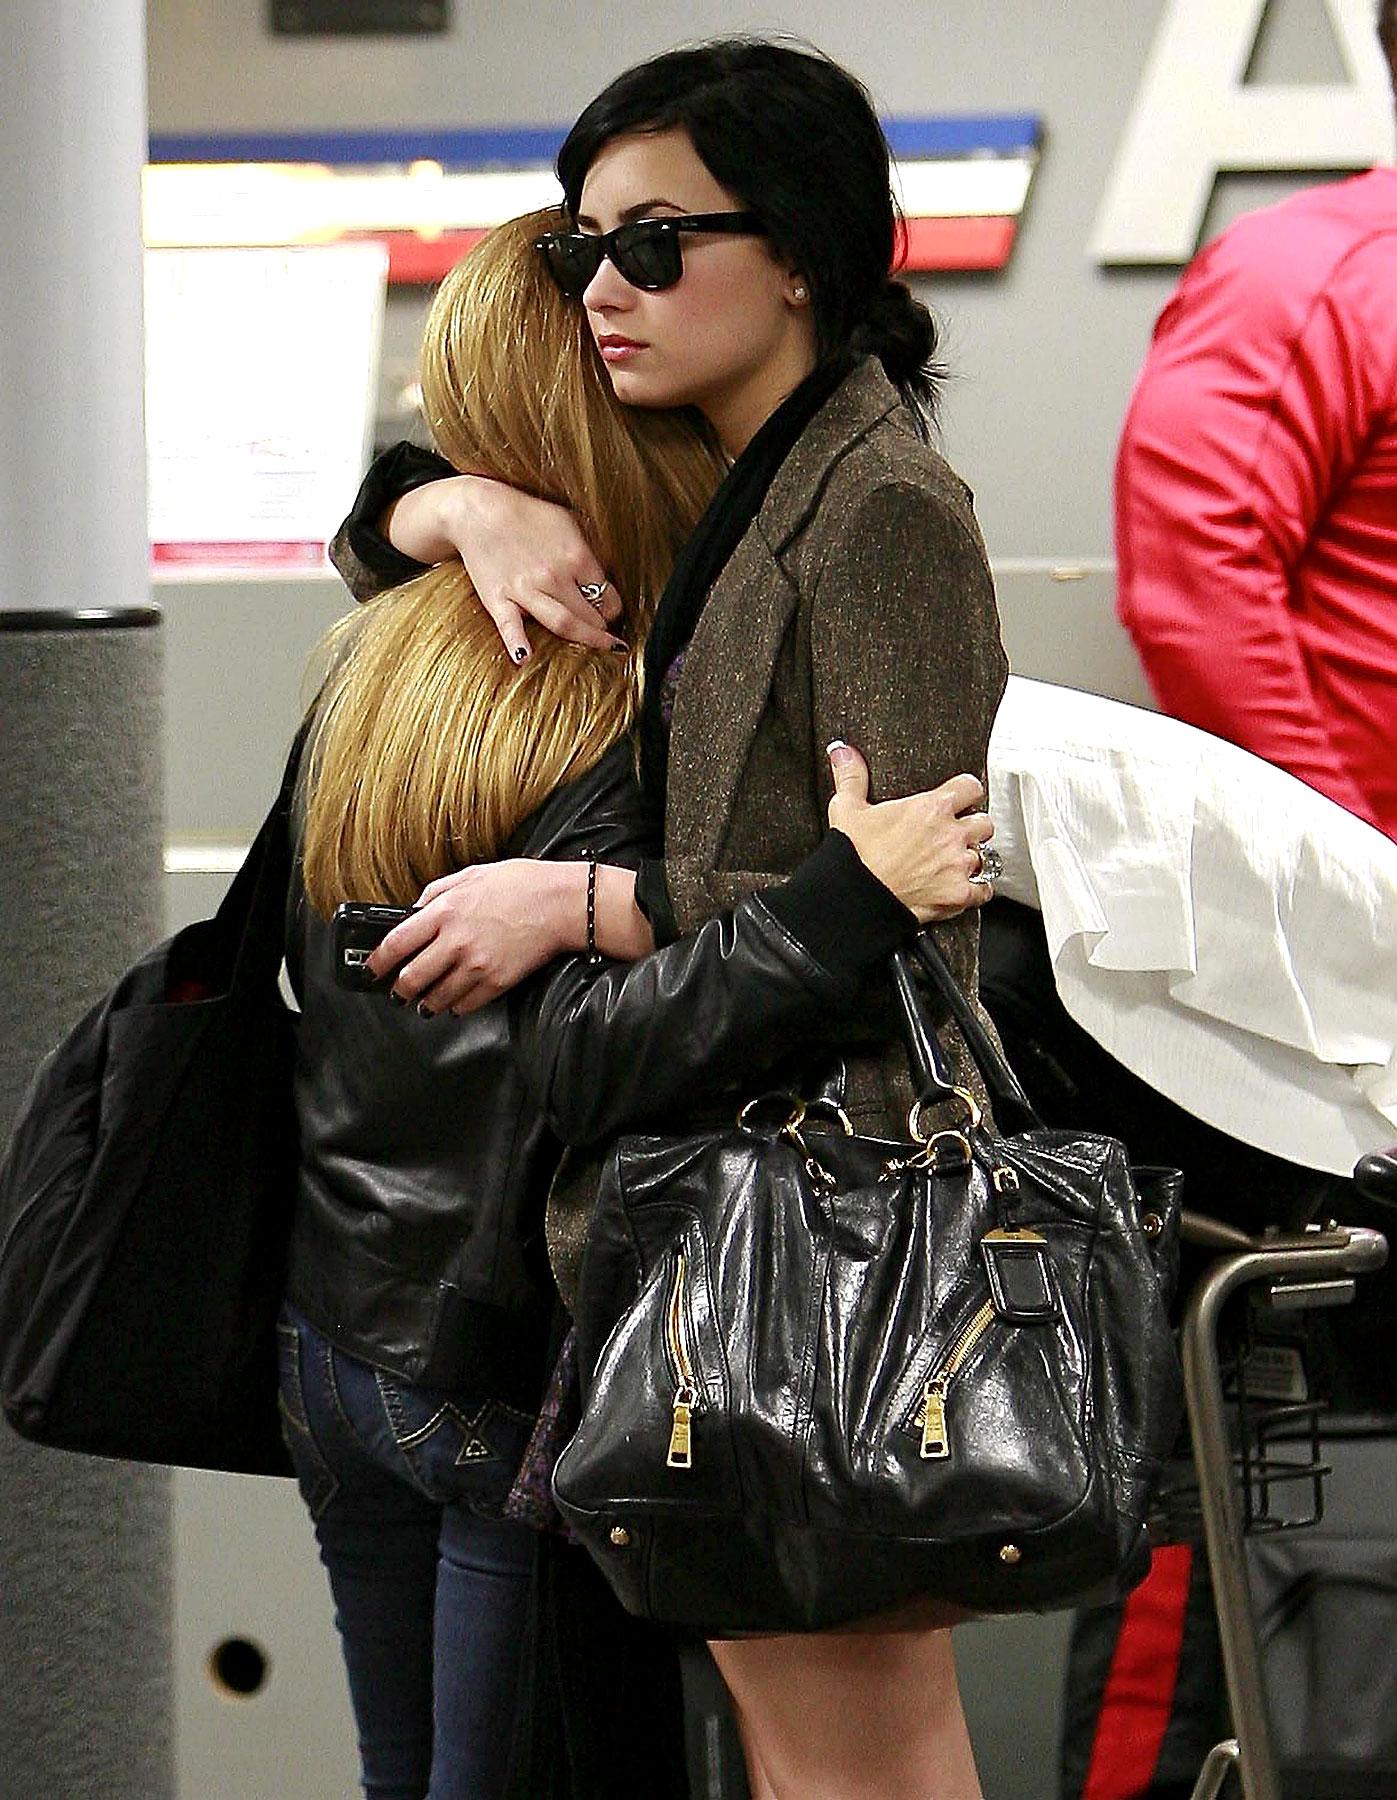 PHOTO GALLERY: Demi Lovato's Airport Goodbye